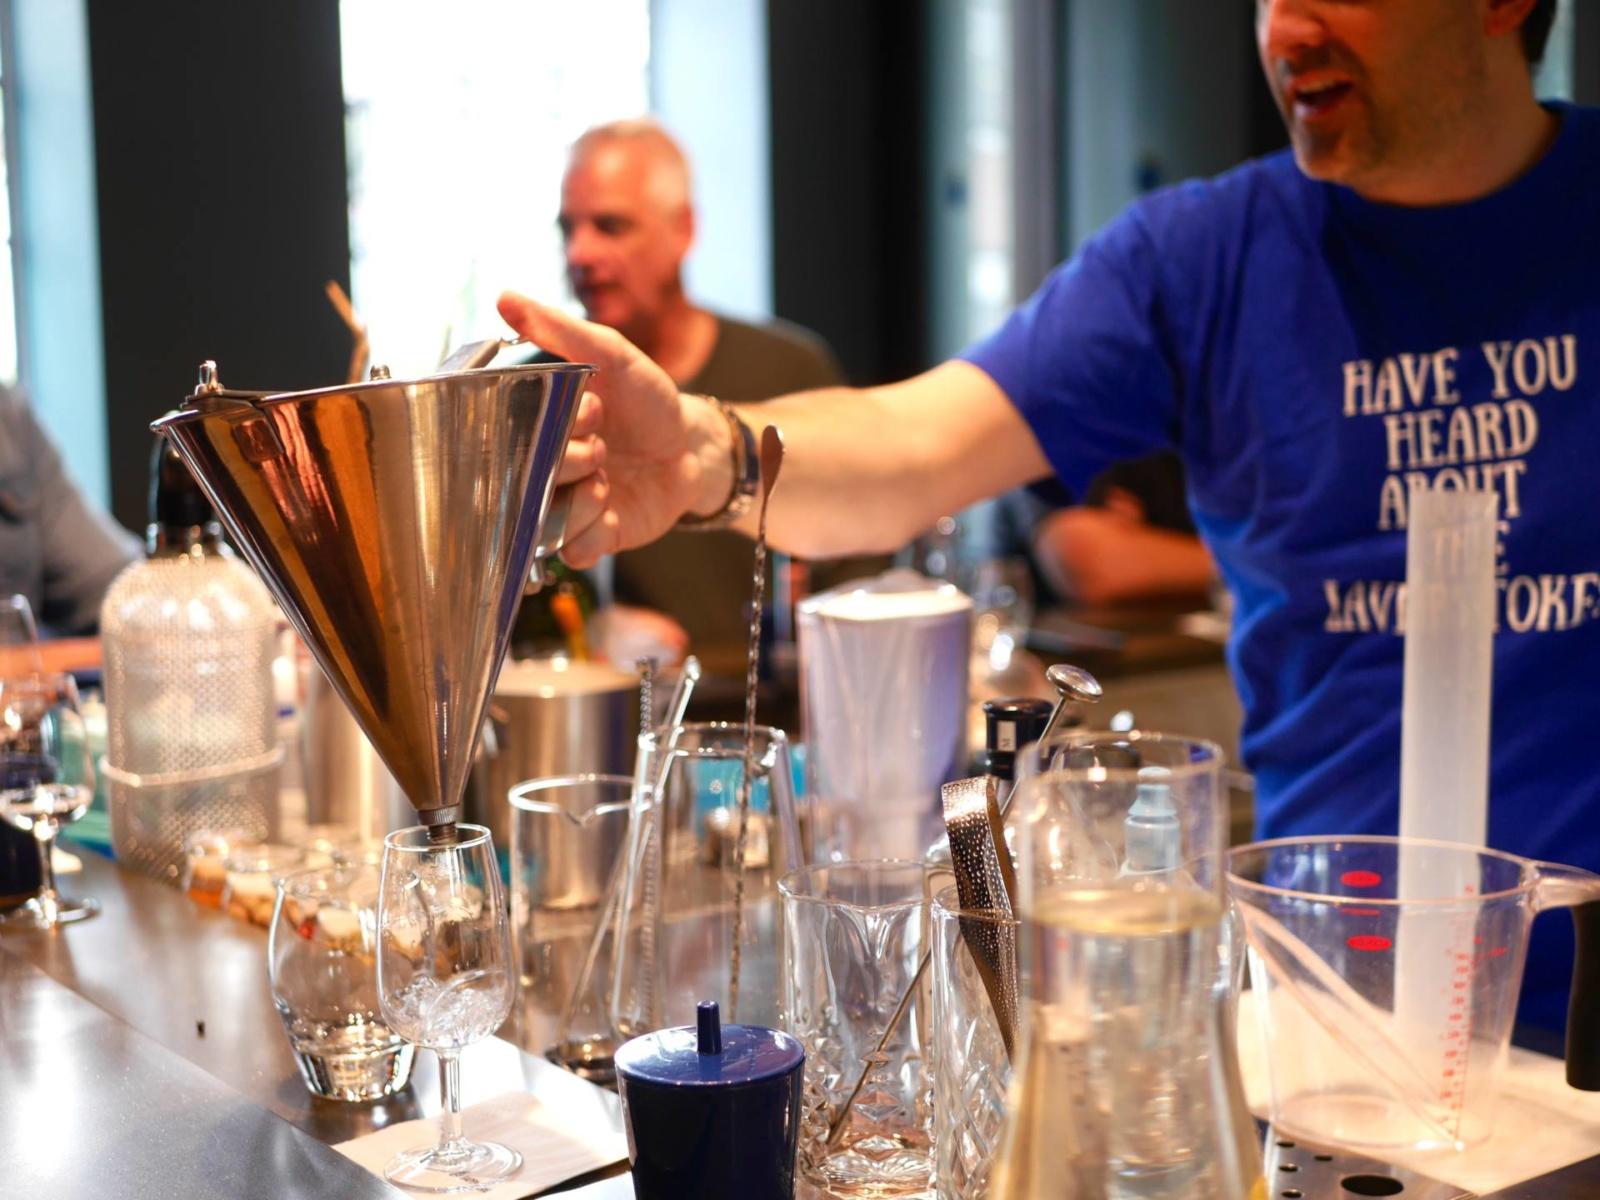 bombay-sapphire-distillery-laverstoke-mill-sam-carter